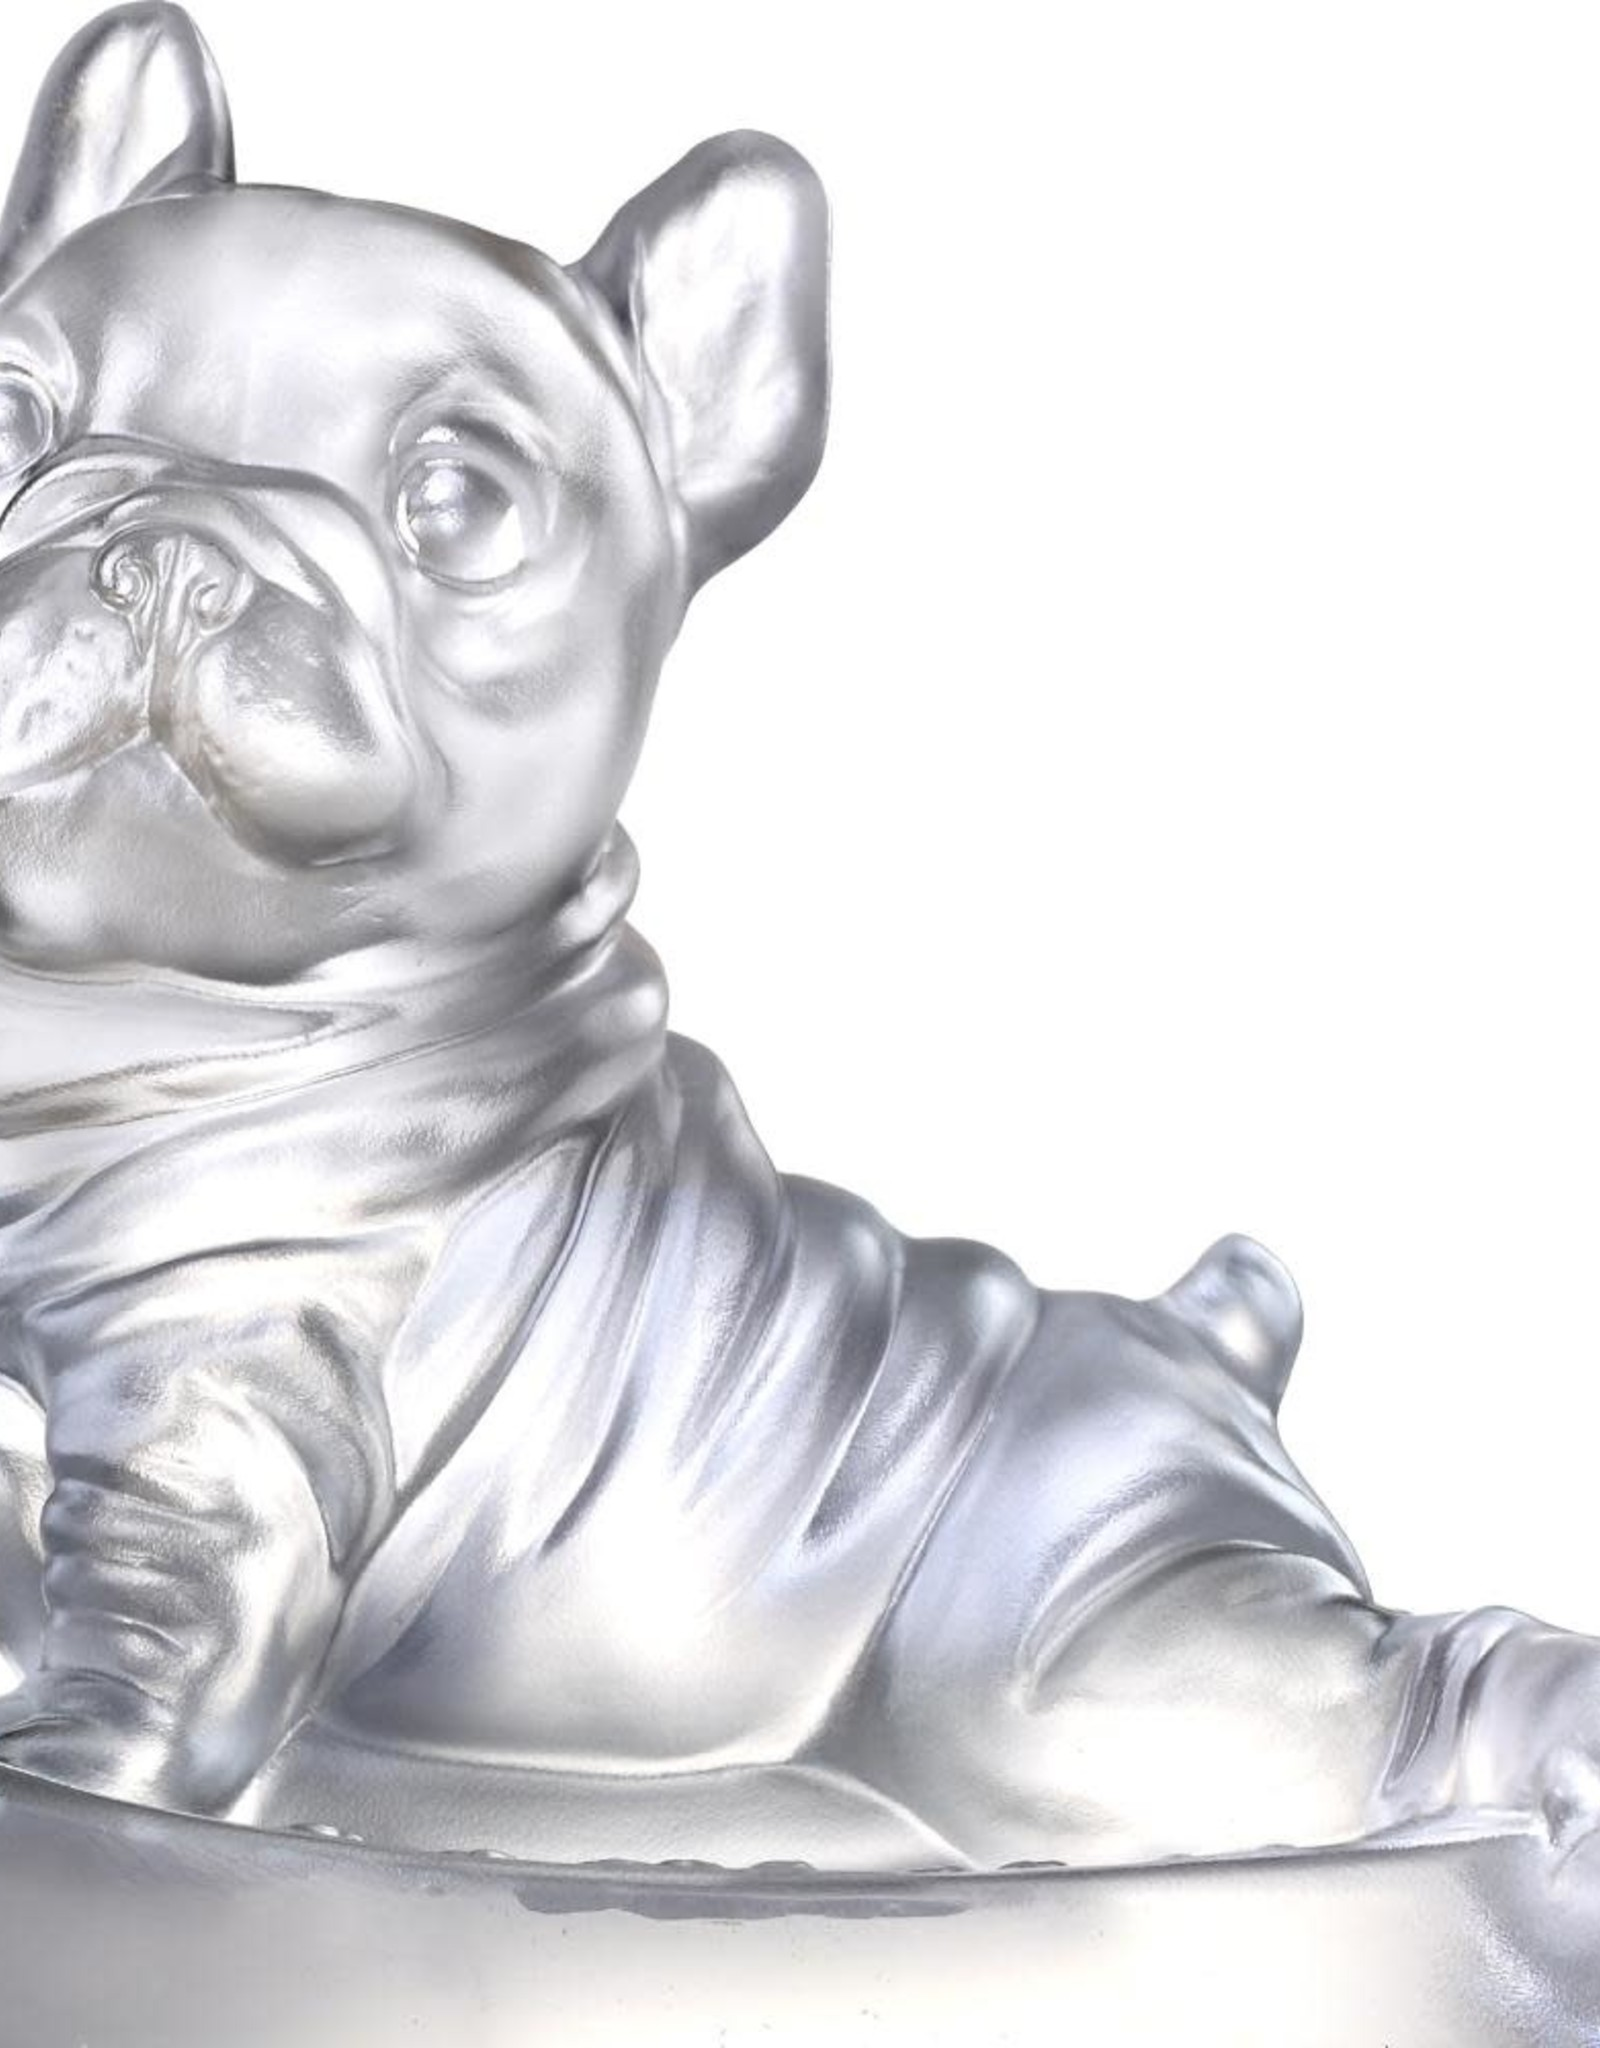 LIULI Crystal Art Crystal French Bulldog